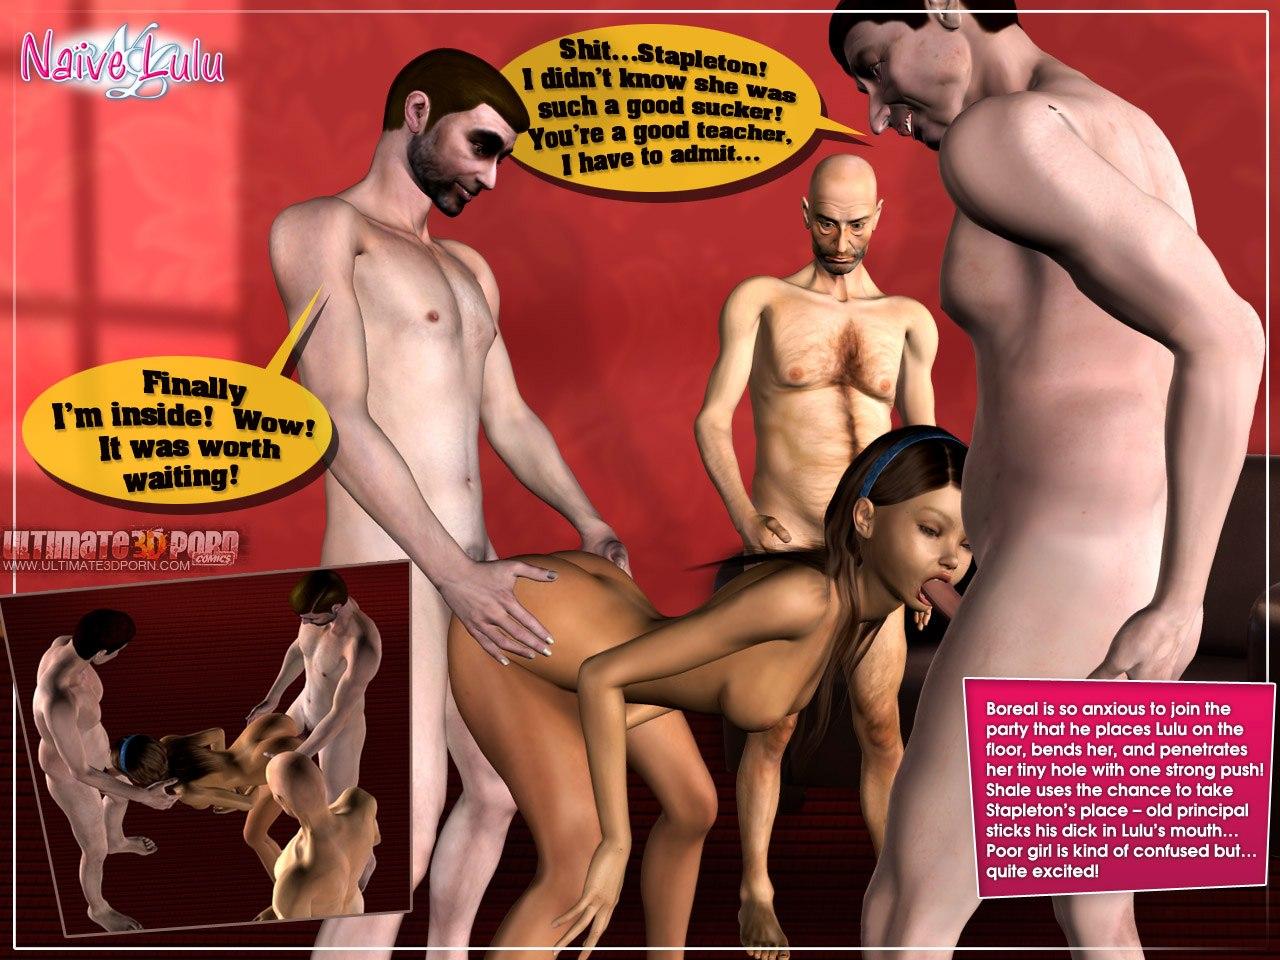 Naive Lulu 1- Ultimate 3D Porn - part 5